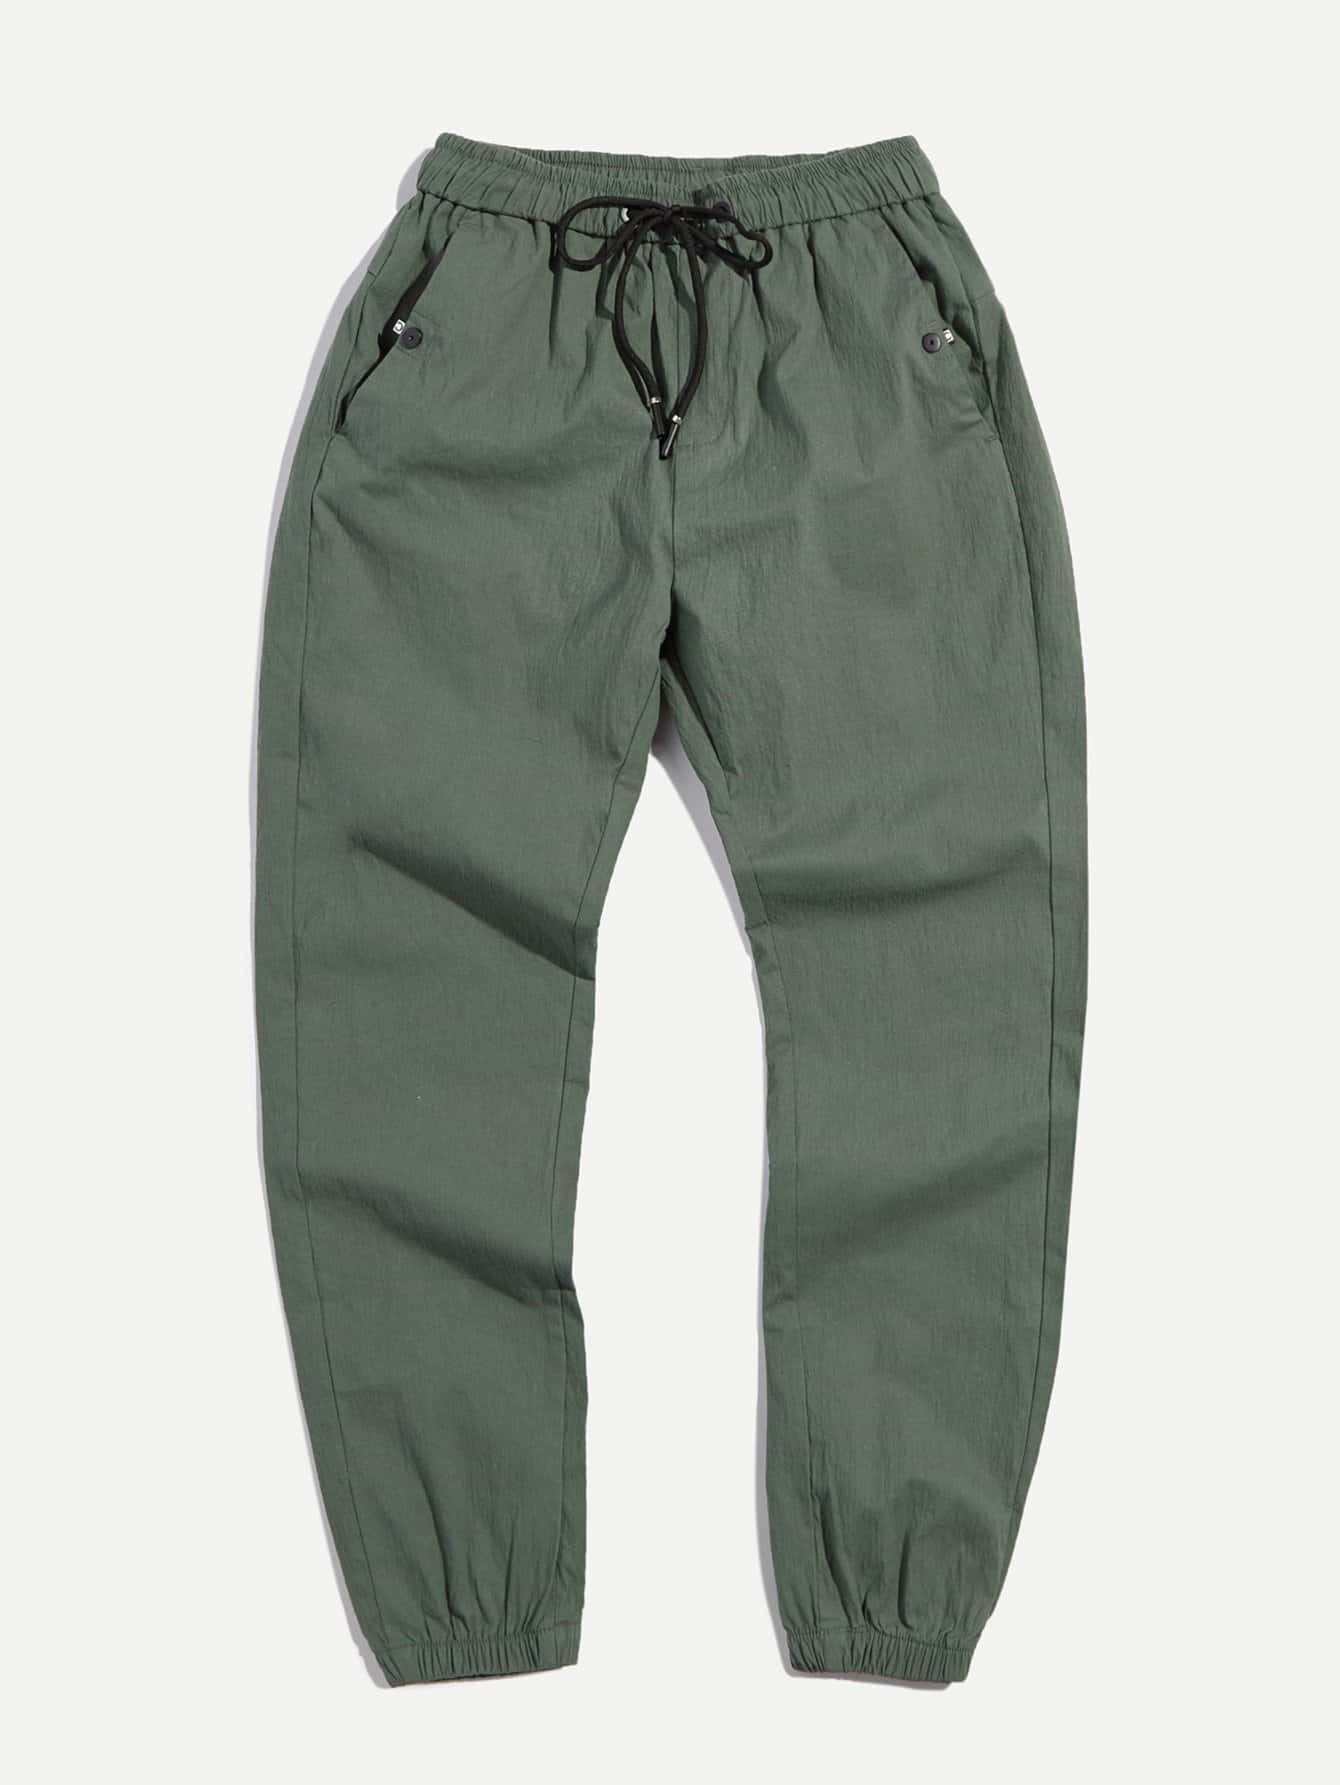 Men Elastic Foot Drawstring Pants men elastic foot drawstring jeans